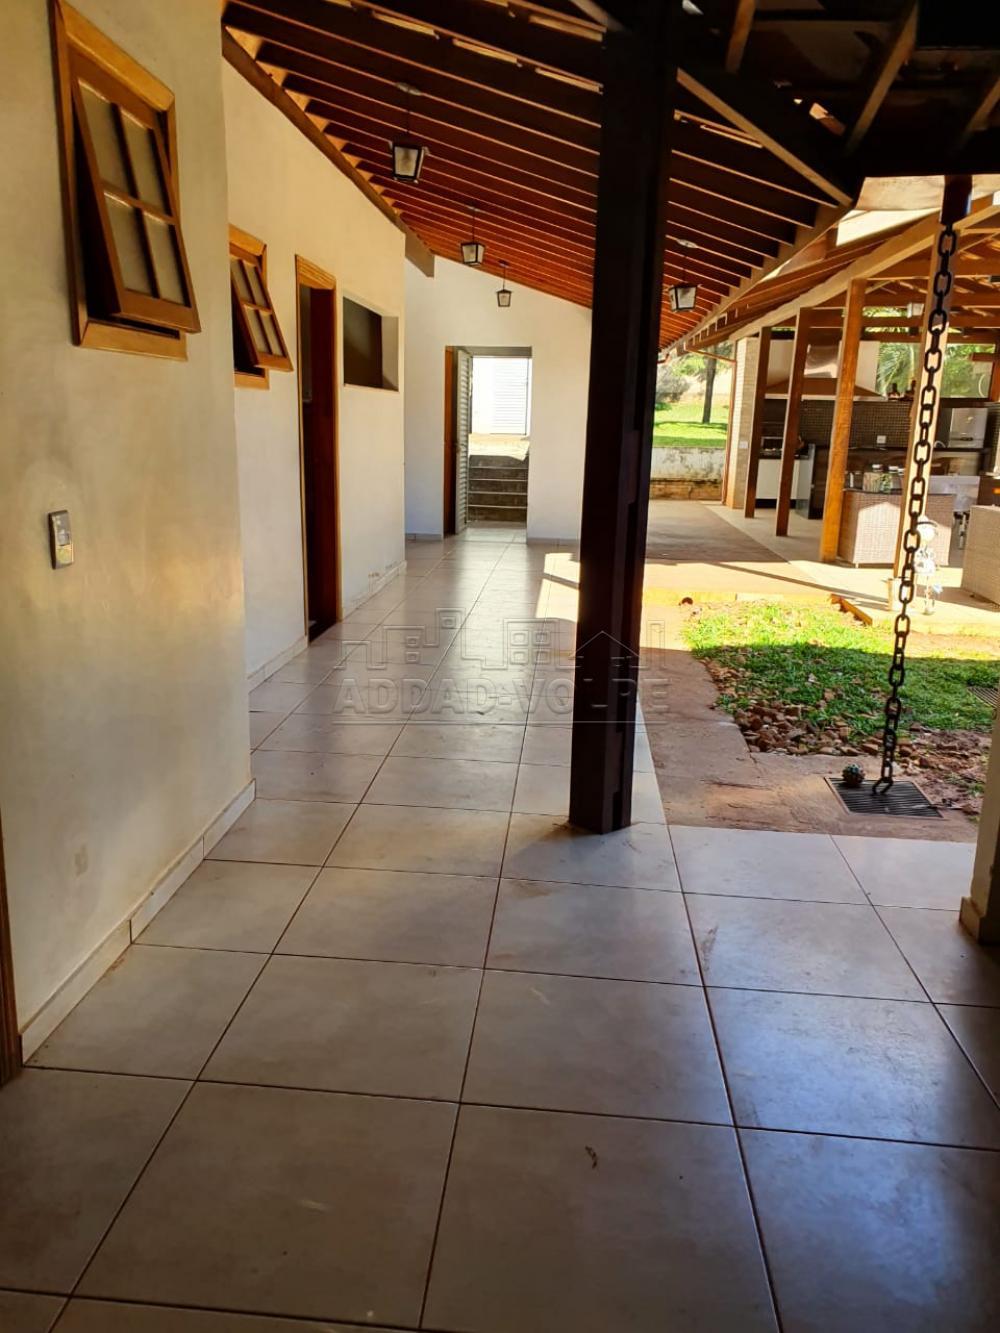 Comprar Casa / Condomínio em Bauru apenas R$ 2.700.000,00 - Foto 22